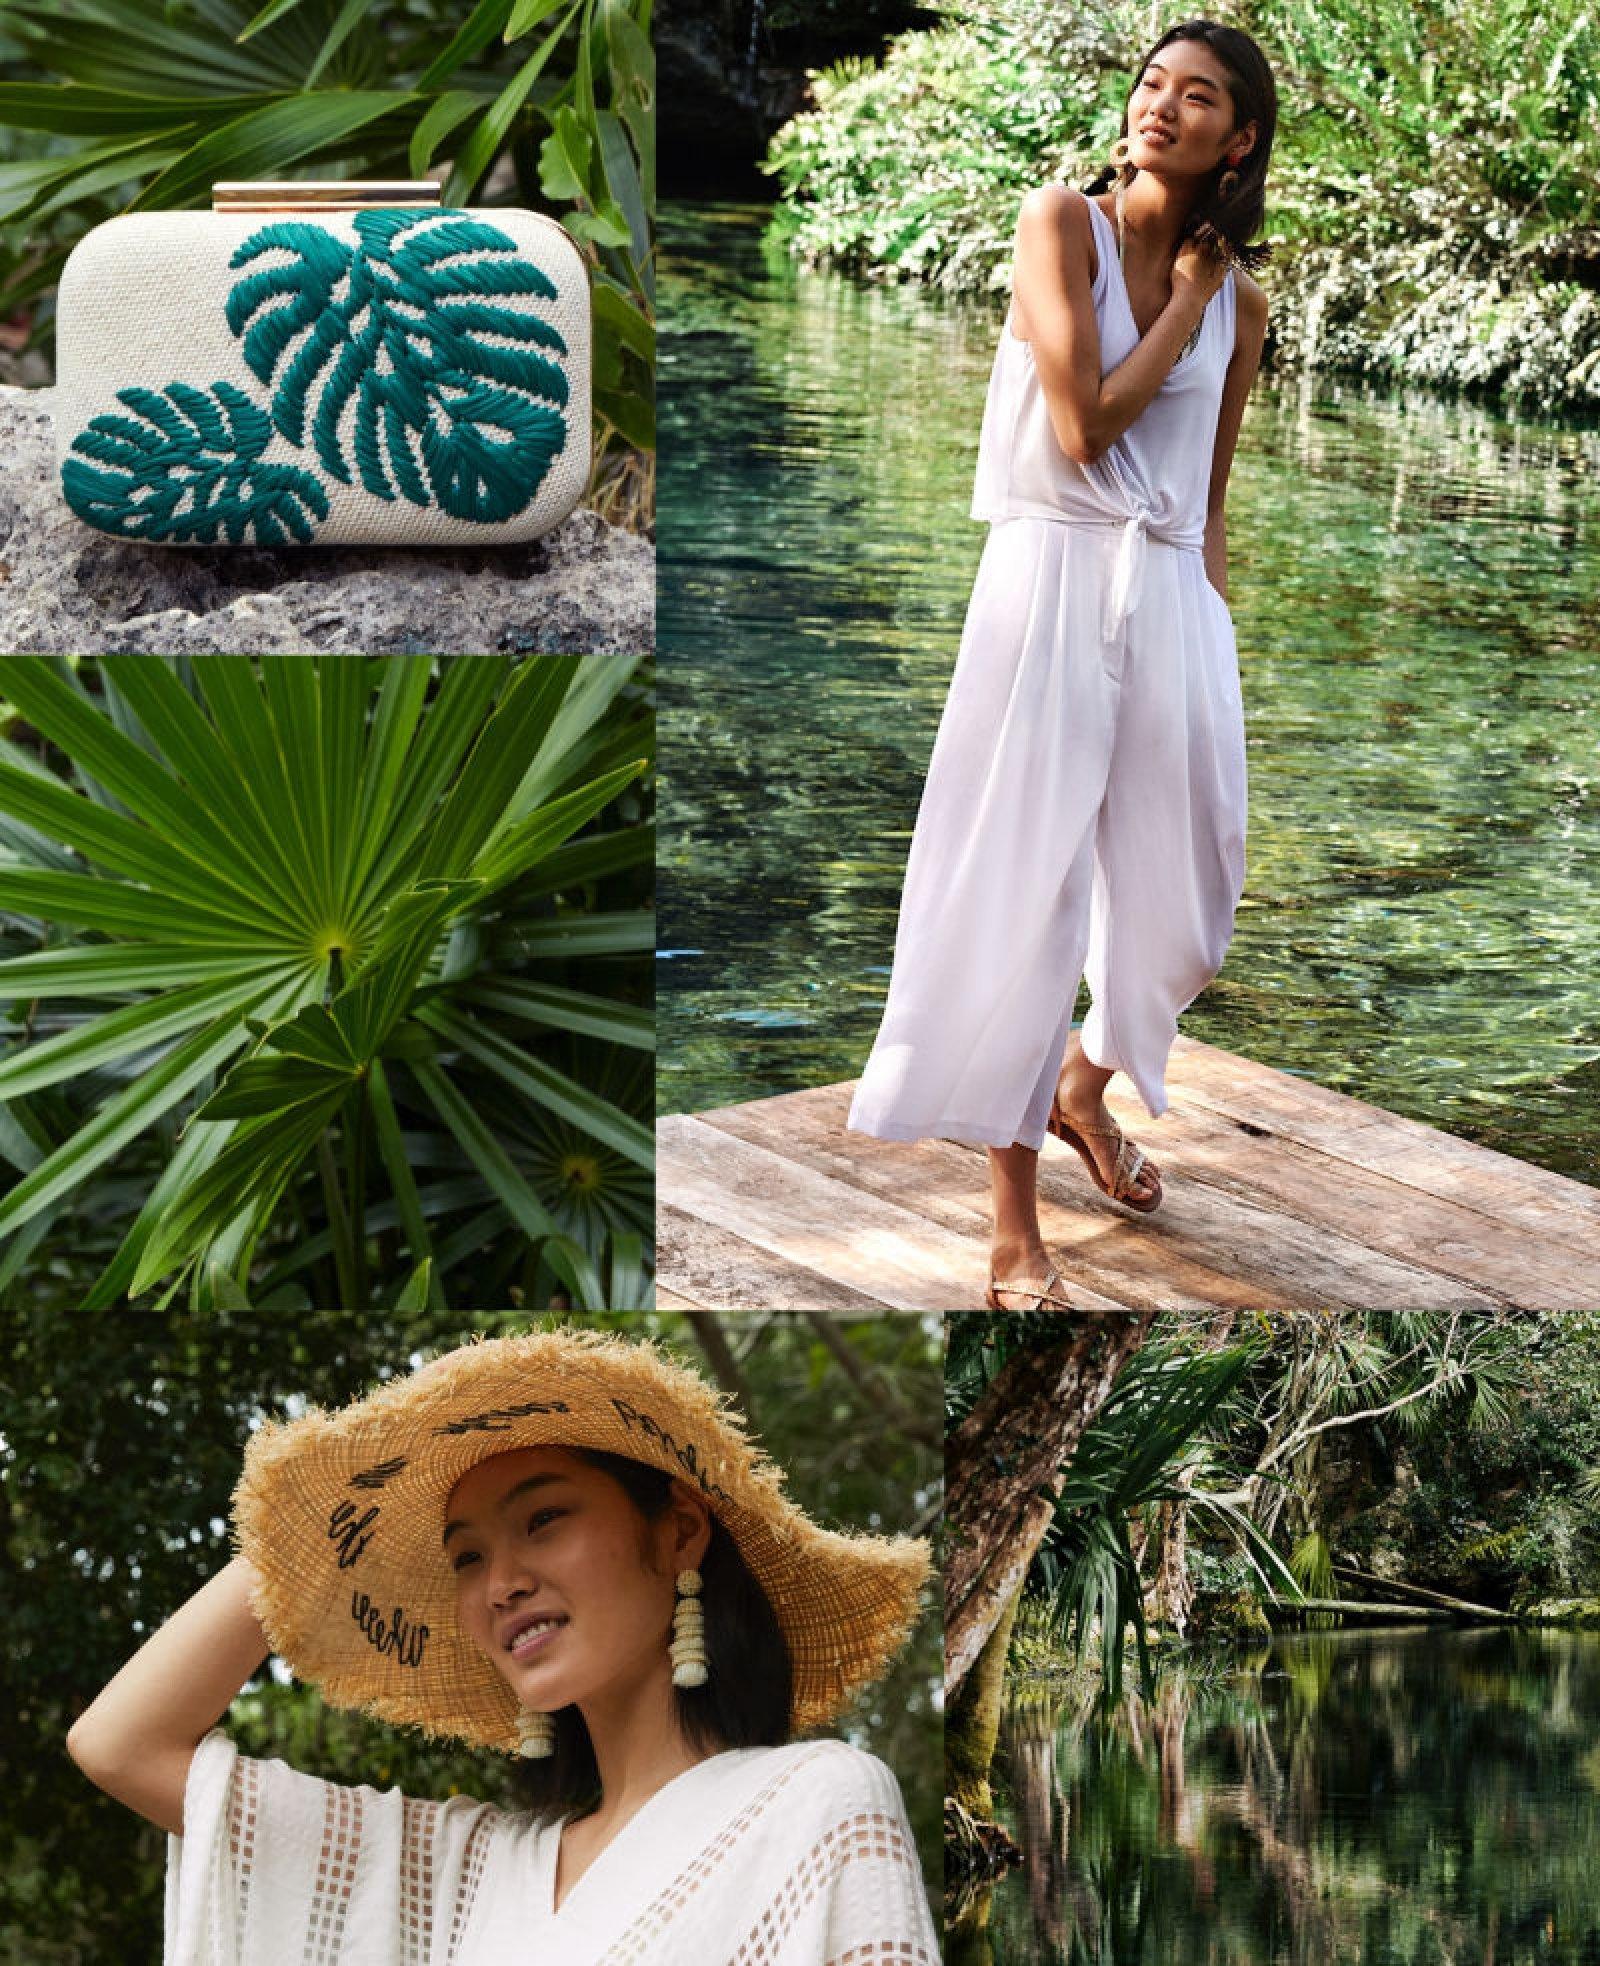 Prendas vaporosas en color blanco llegan a 'Under the sun' de H&M